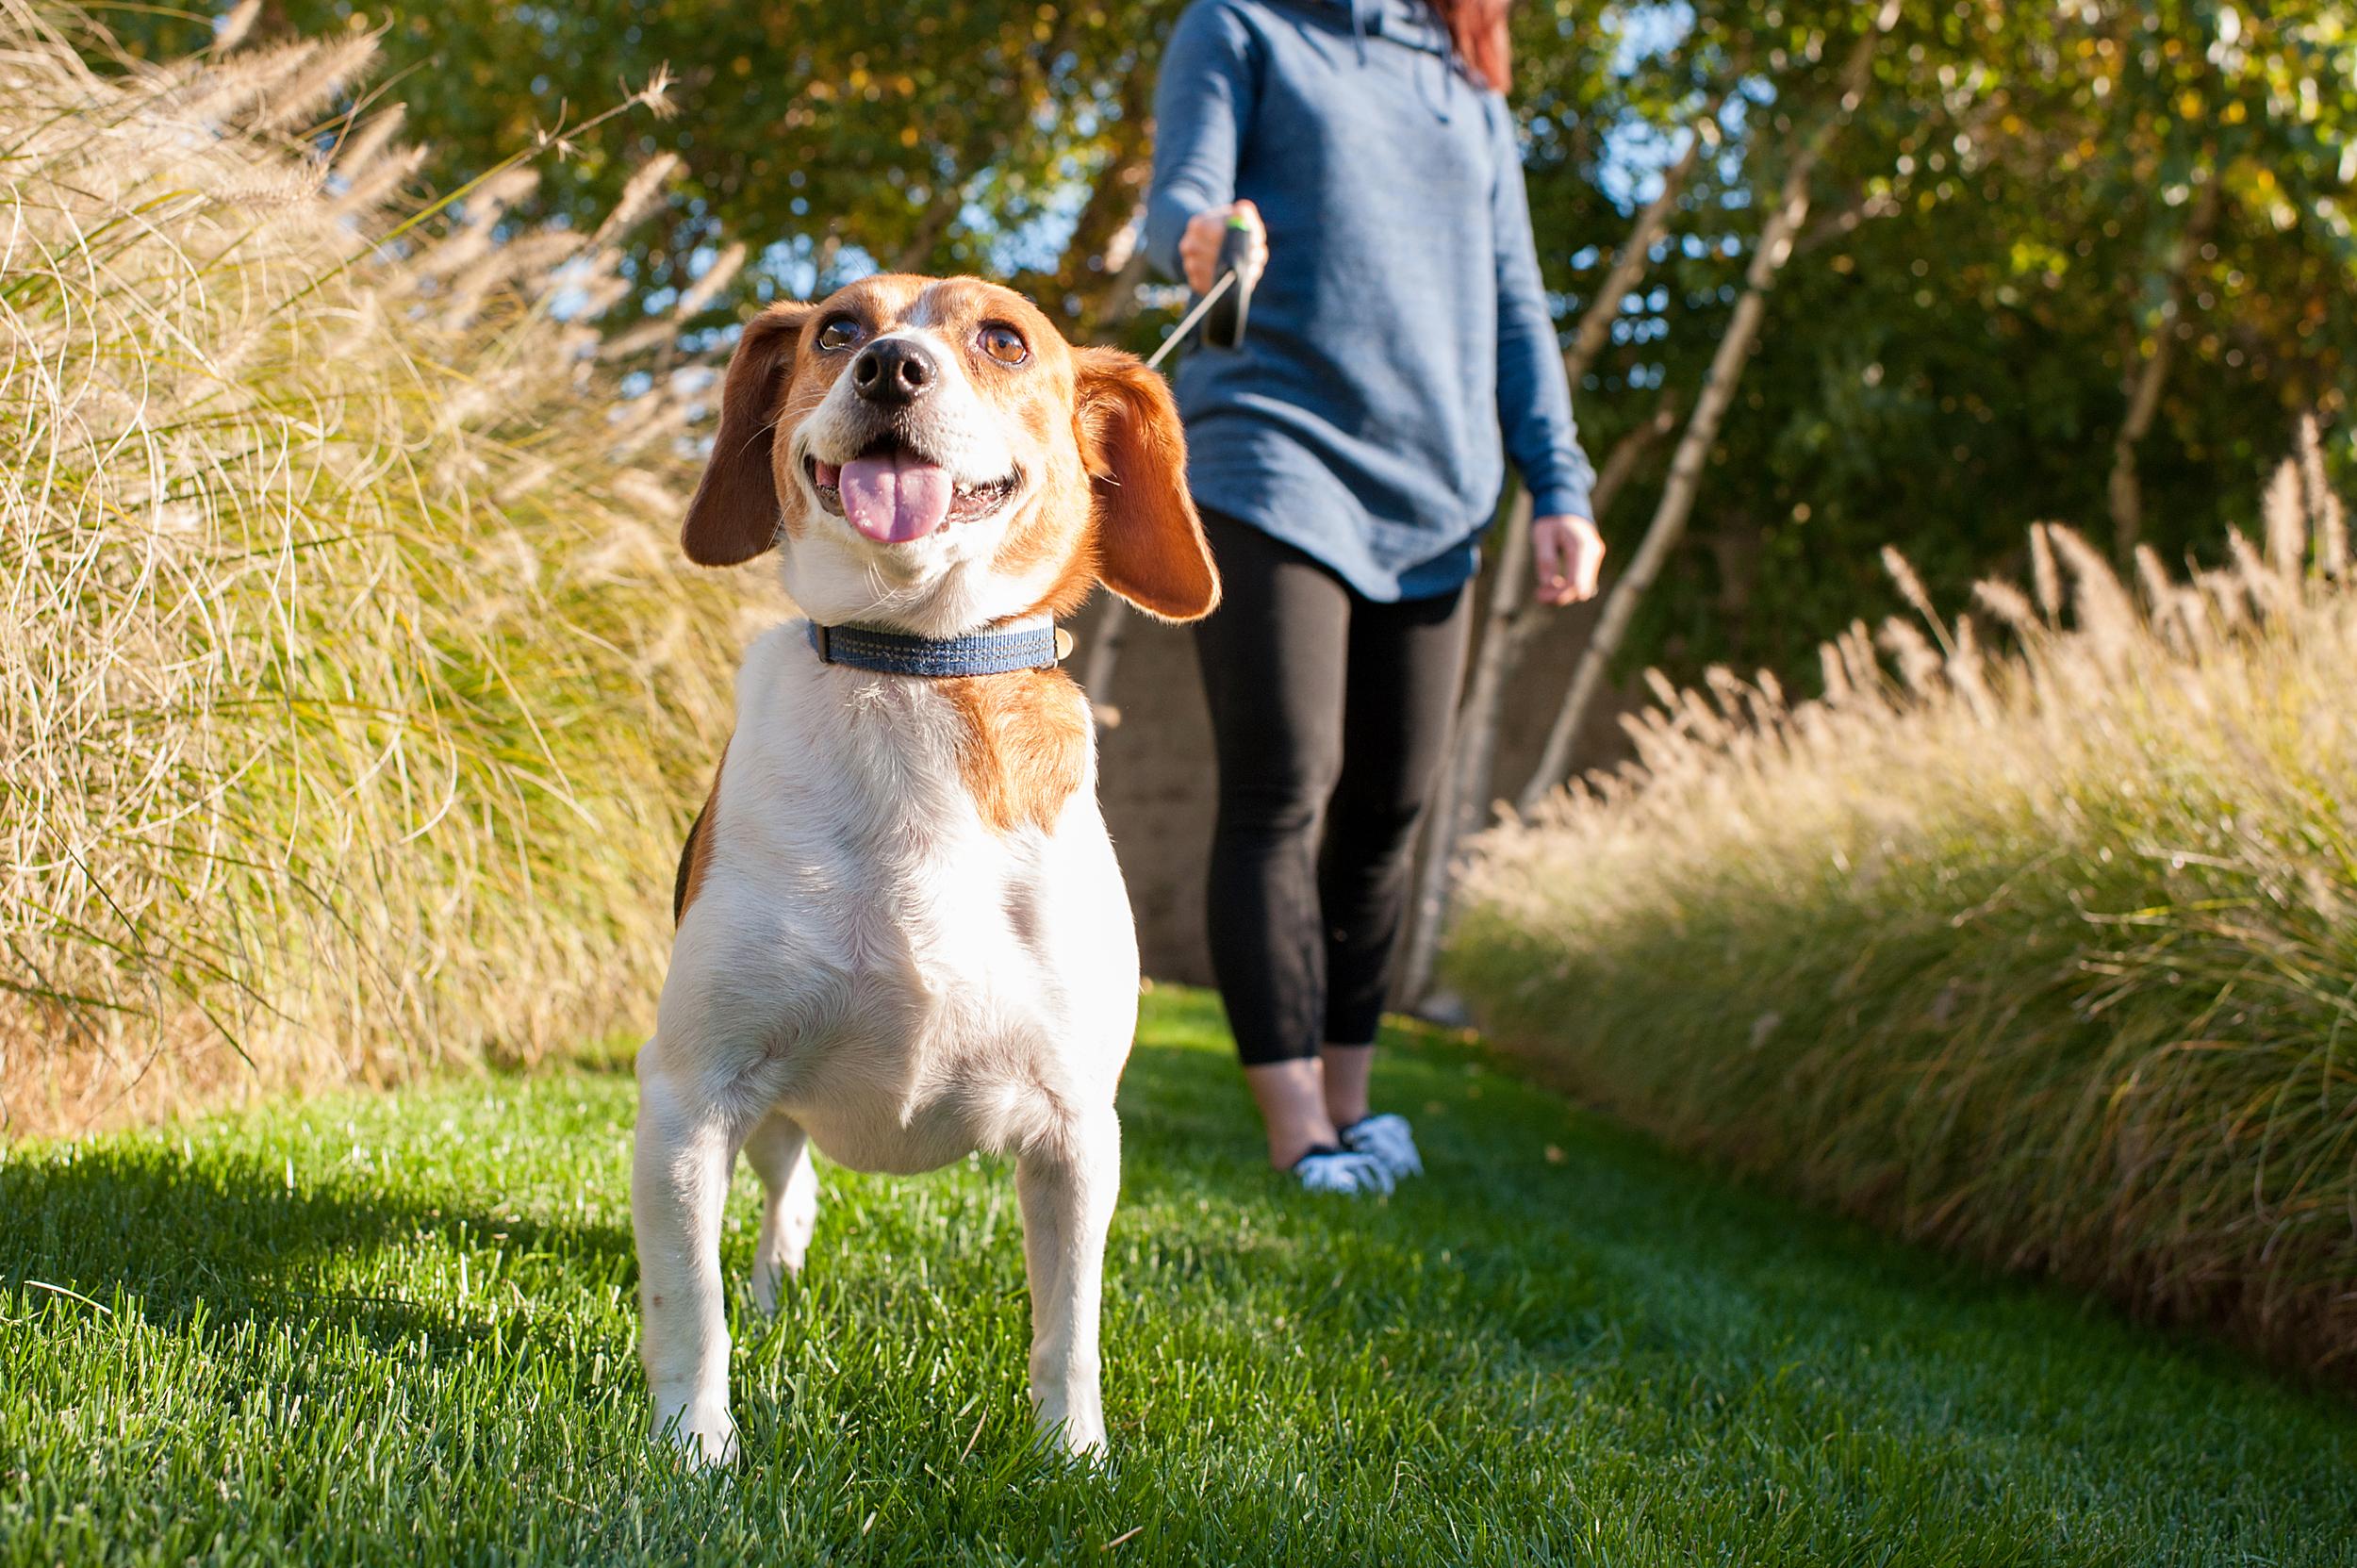 dexter jack-a-bee dog photography pittsburgh 009.jpg